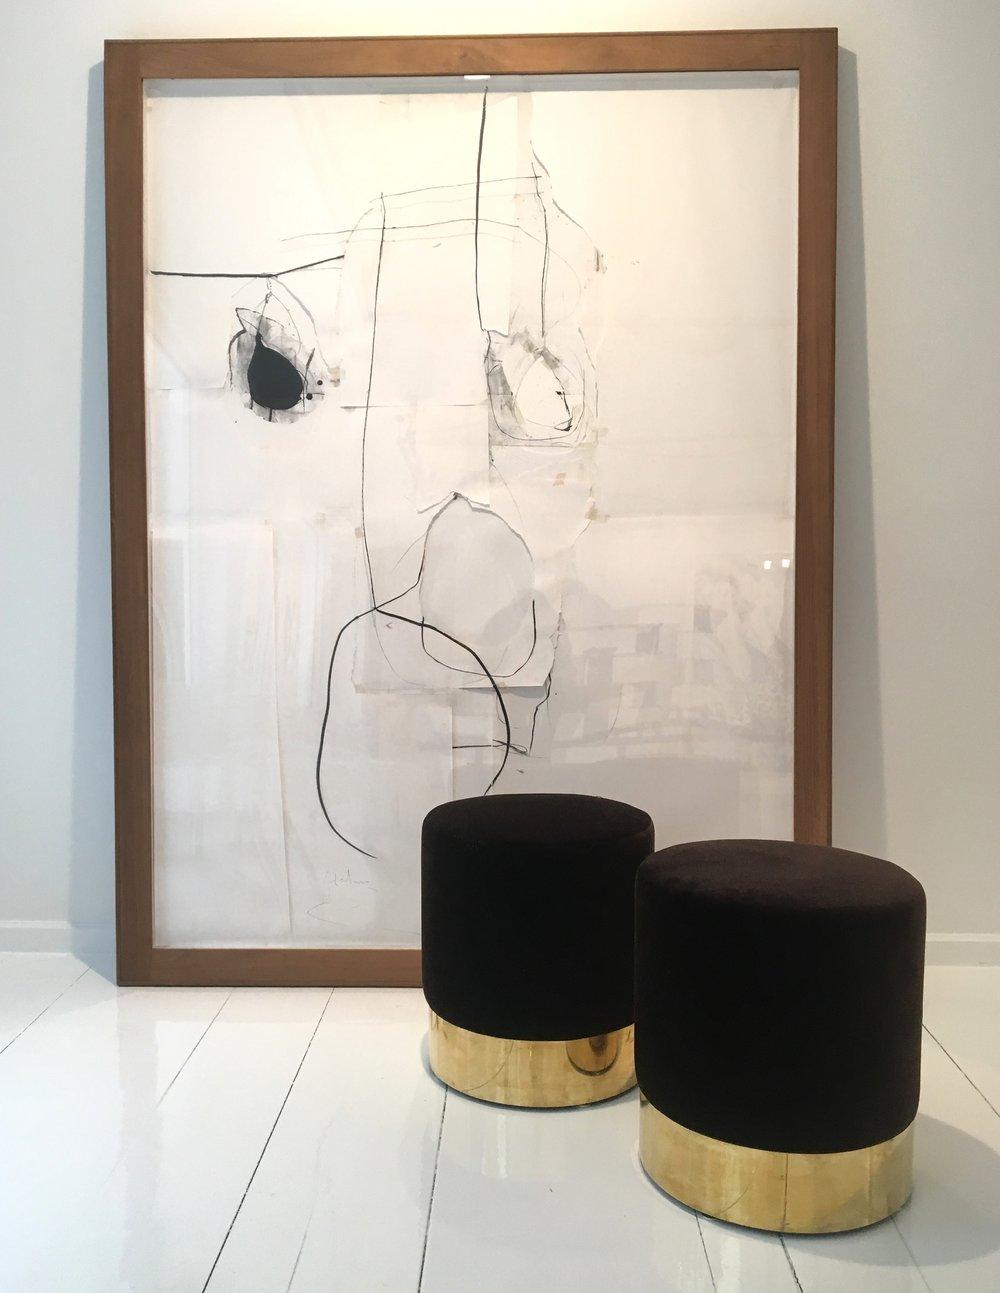 Colección cilindro- pouff fondo blanco (2)-min.JPG